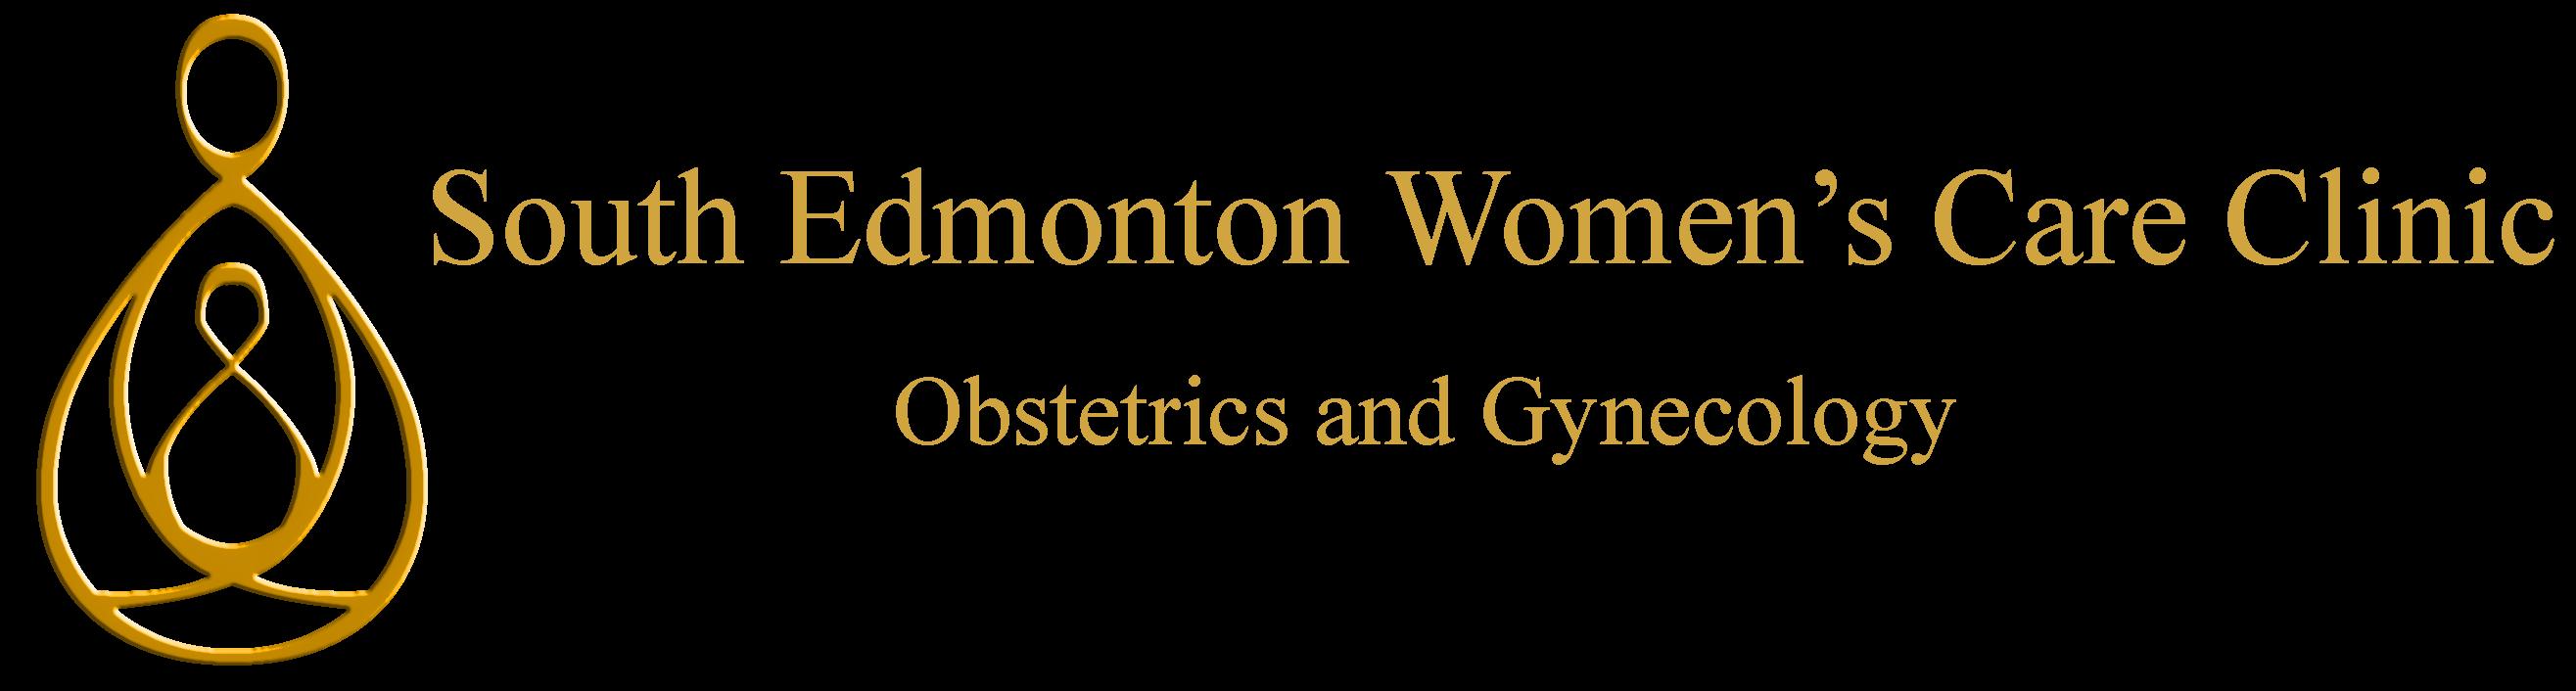 South Edmonton Women's Care Clinic